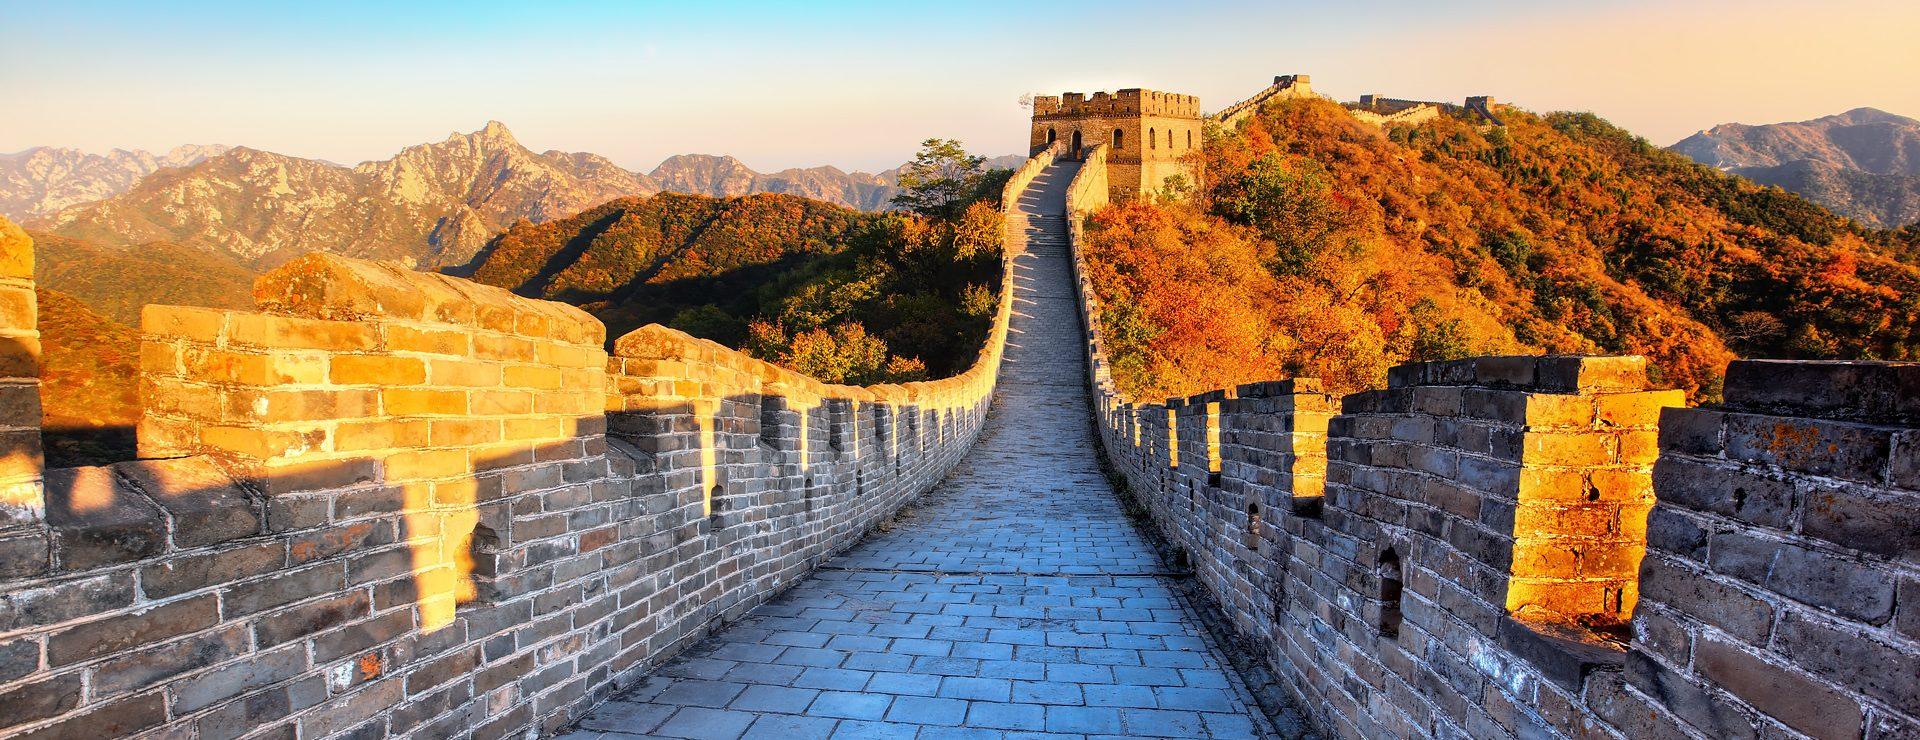 Kina beordrar fabriker att stanga